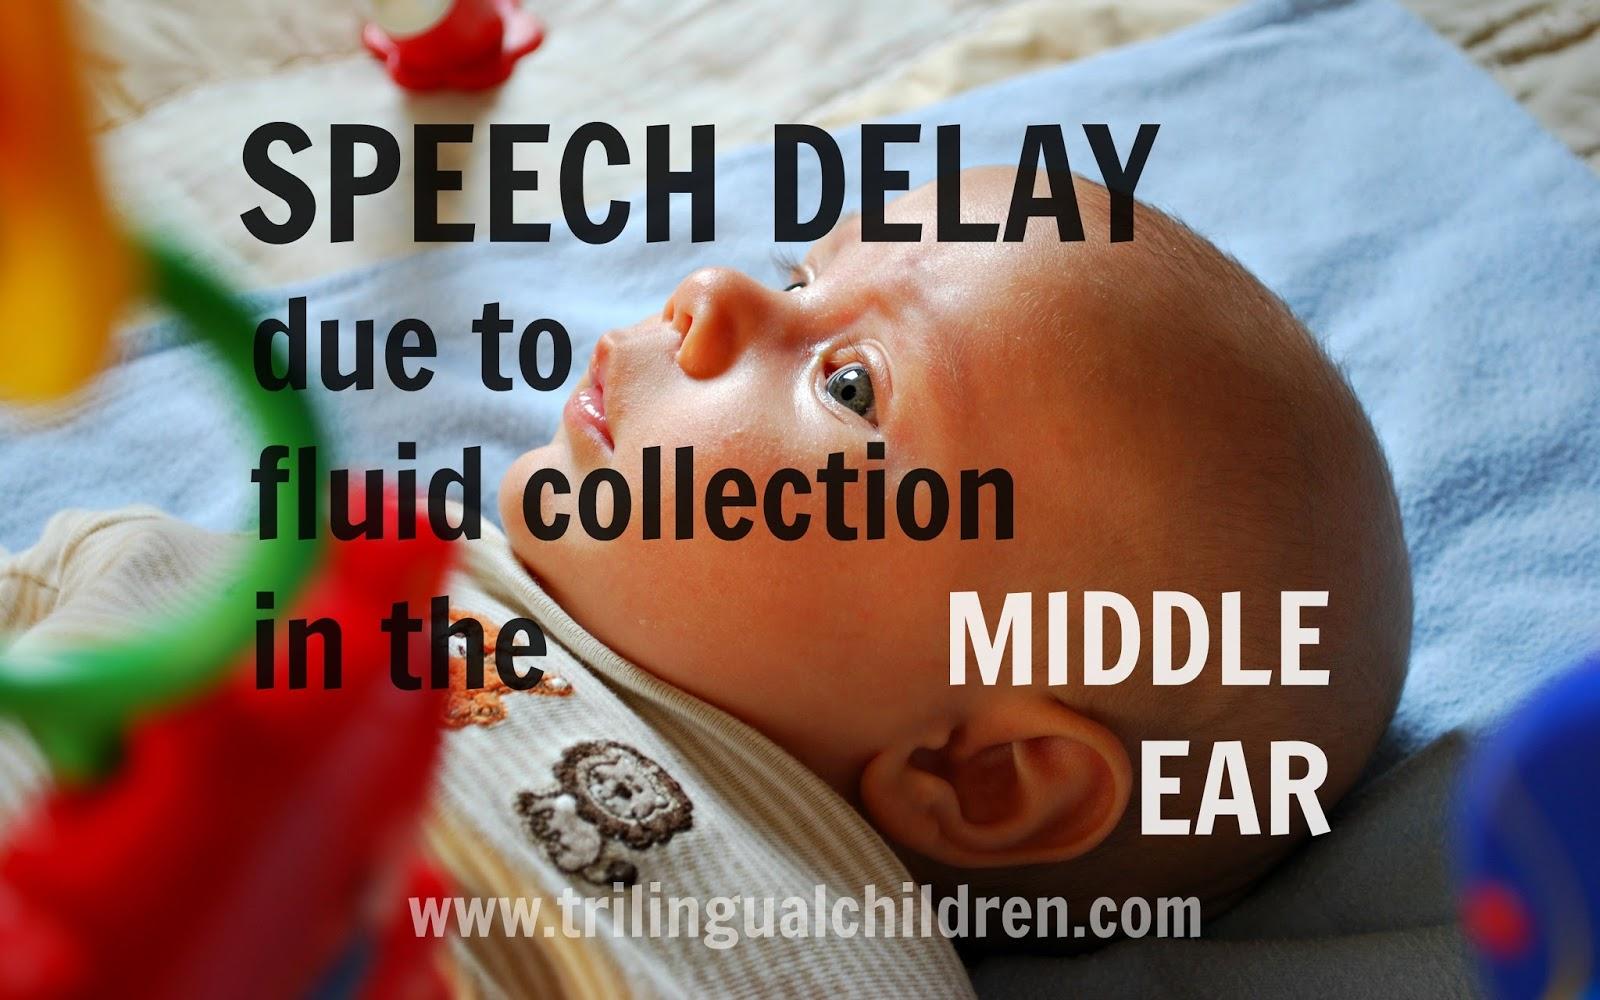 Speech delay at the kid